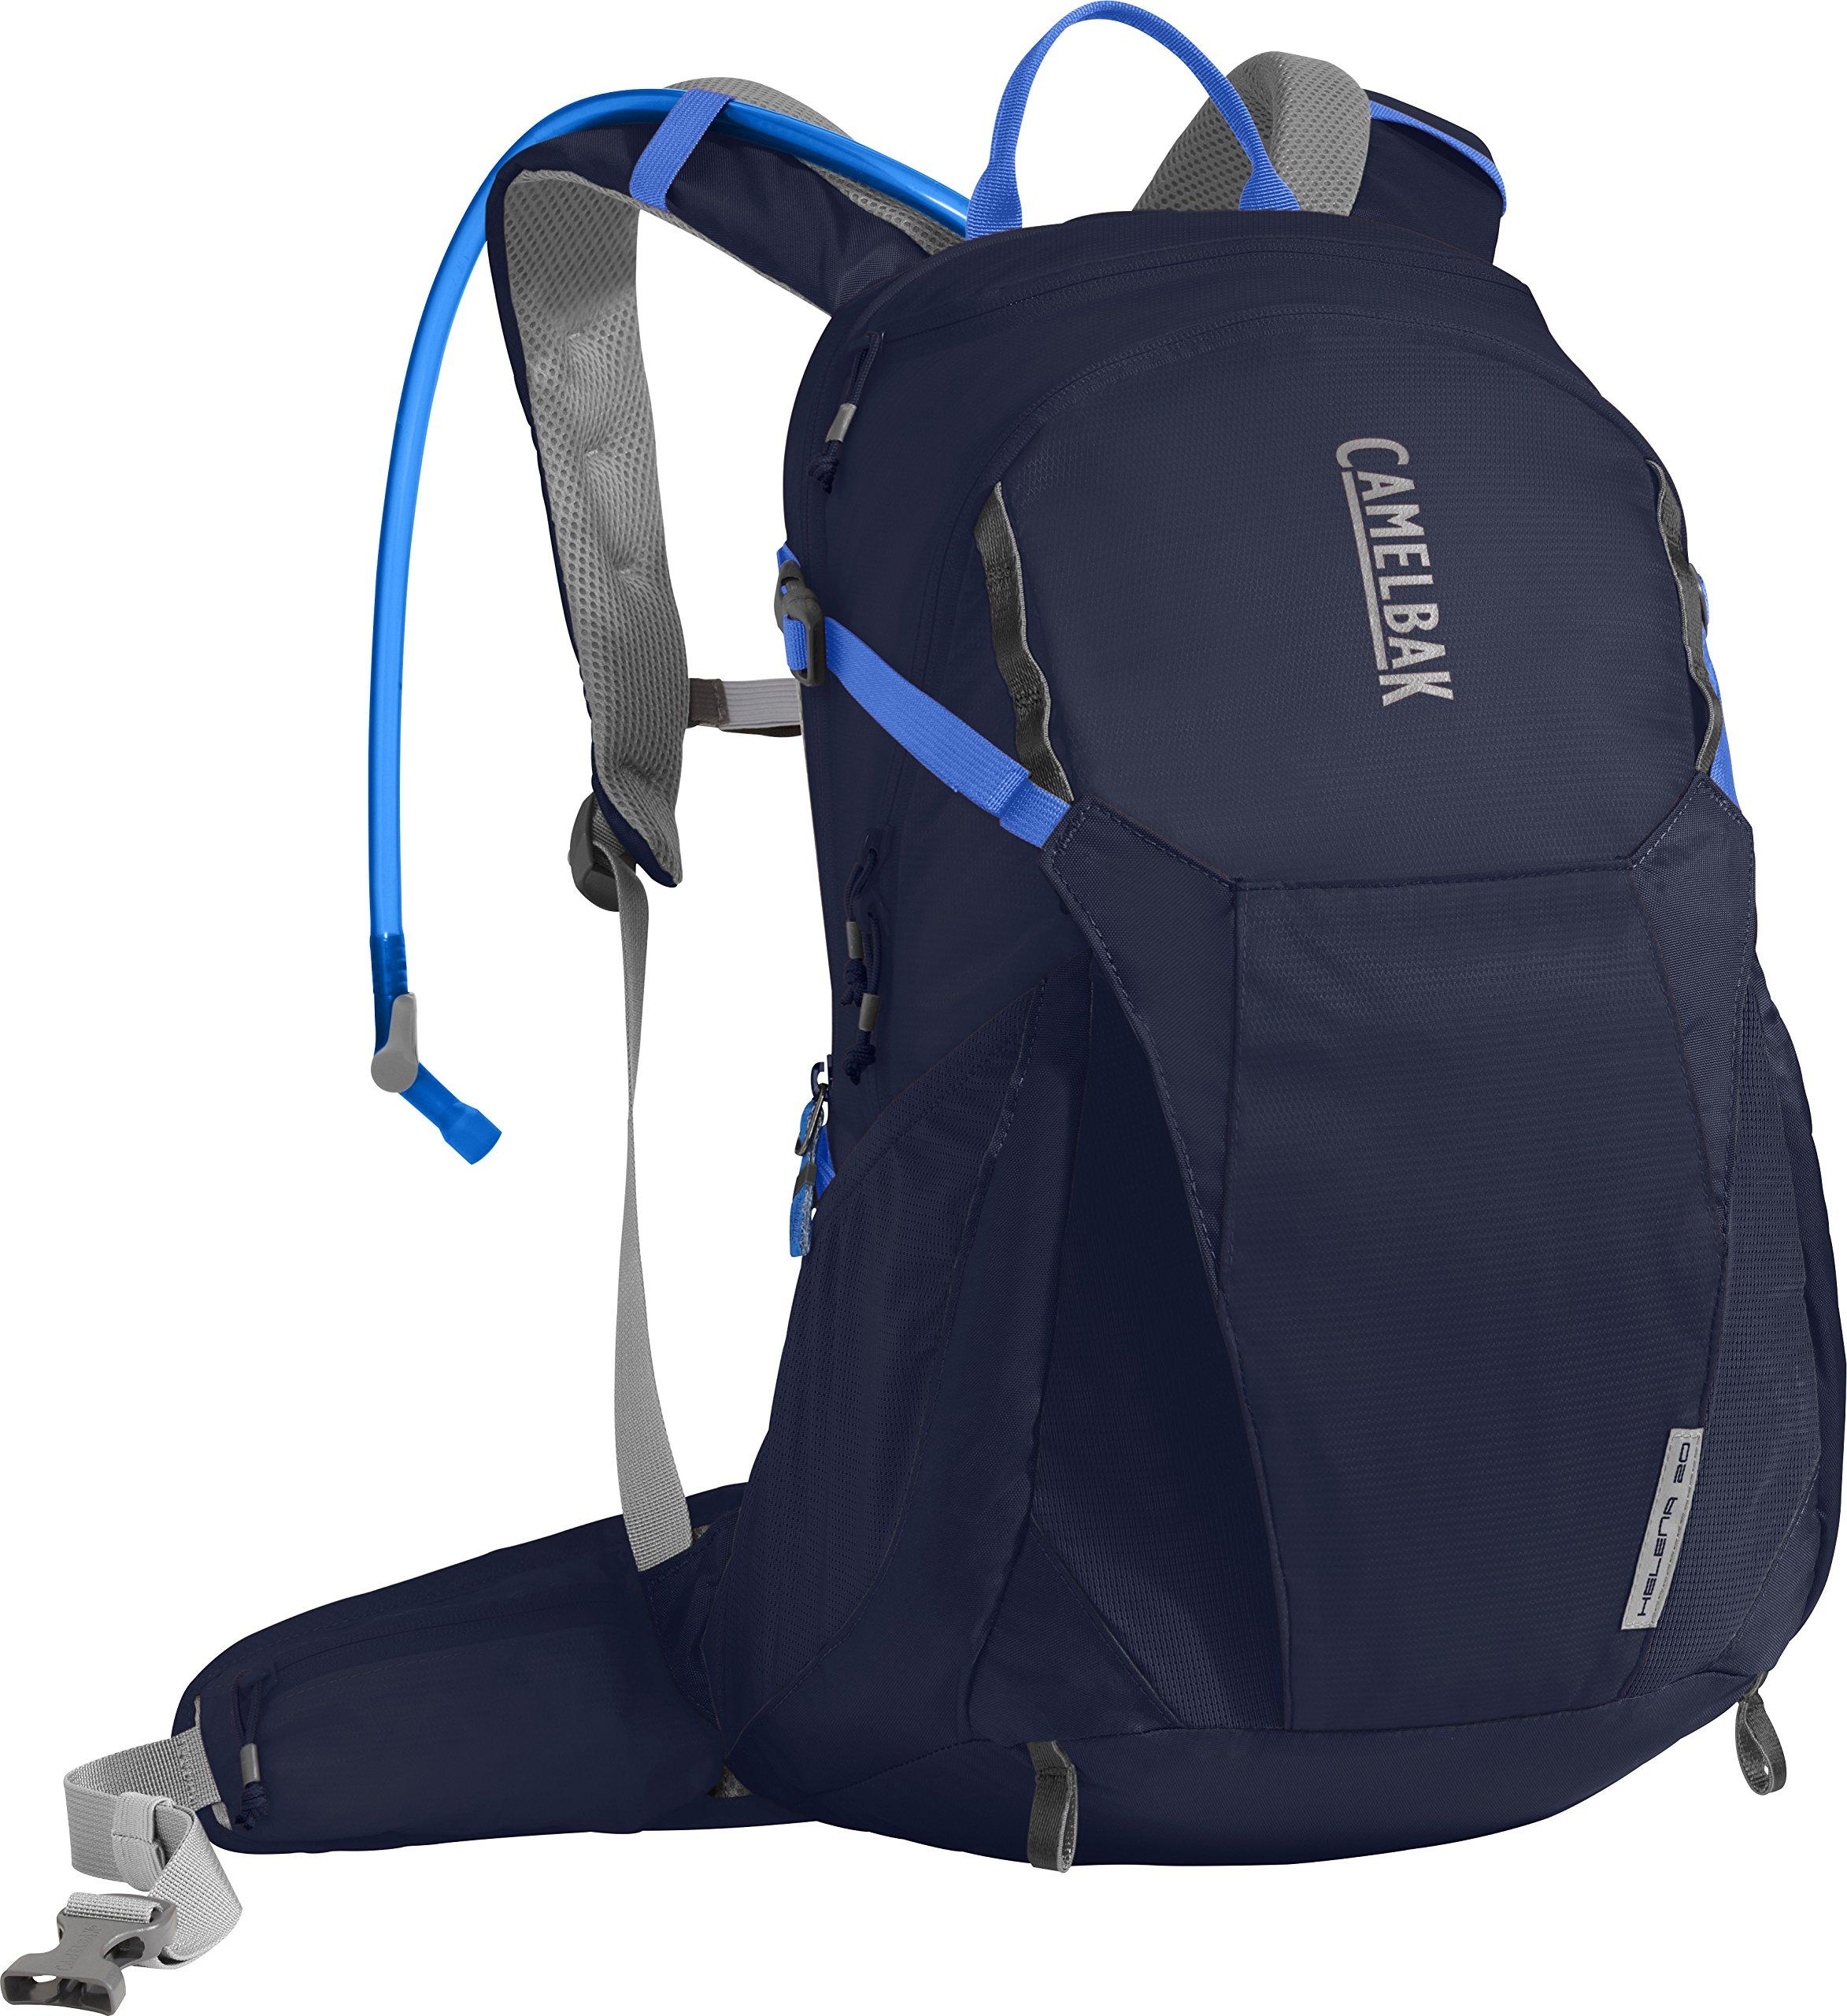 CamelBak Women's Helena 20 Crux Reservoir Hydration Pack, Navy Blazer/Amparo Blue, 2.5 L/85 oz by CamelBak